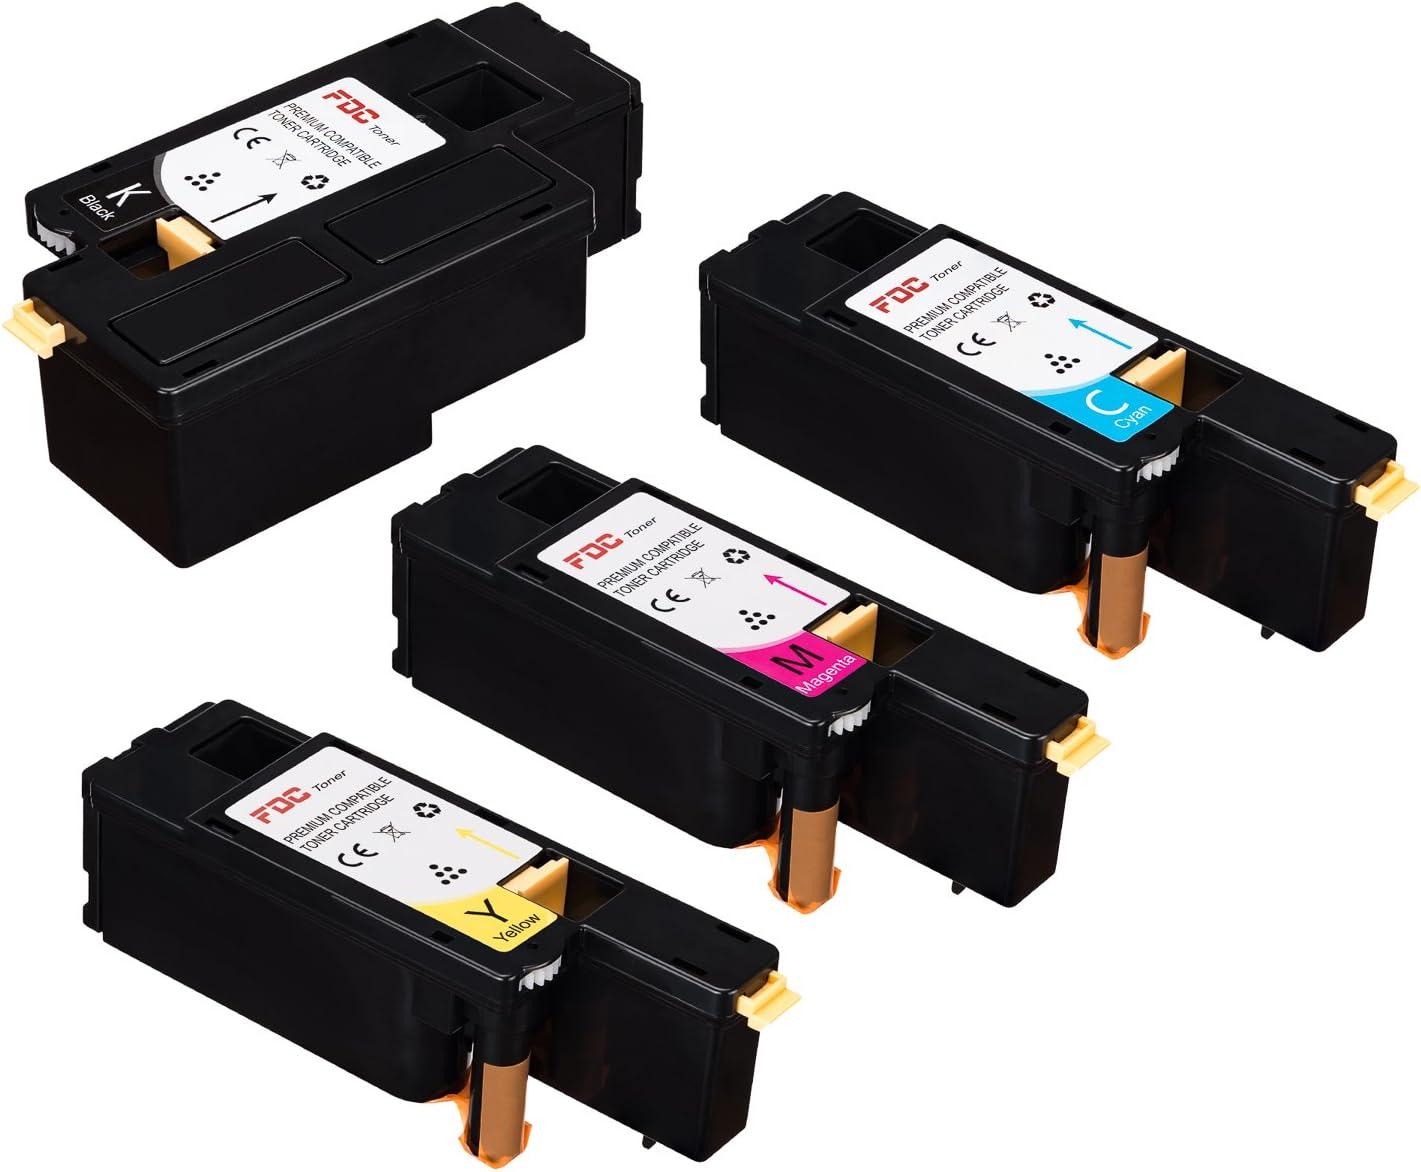 FDC Toner Compatible Dell Color Multi-Function E525W E525 525W Printers Toner Cartridges 4 Pack Replacement for 593-BBJX Black, 593-BBJU Cyan, 593-BBJV Magenta, 593-BBJW Yellow